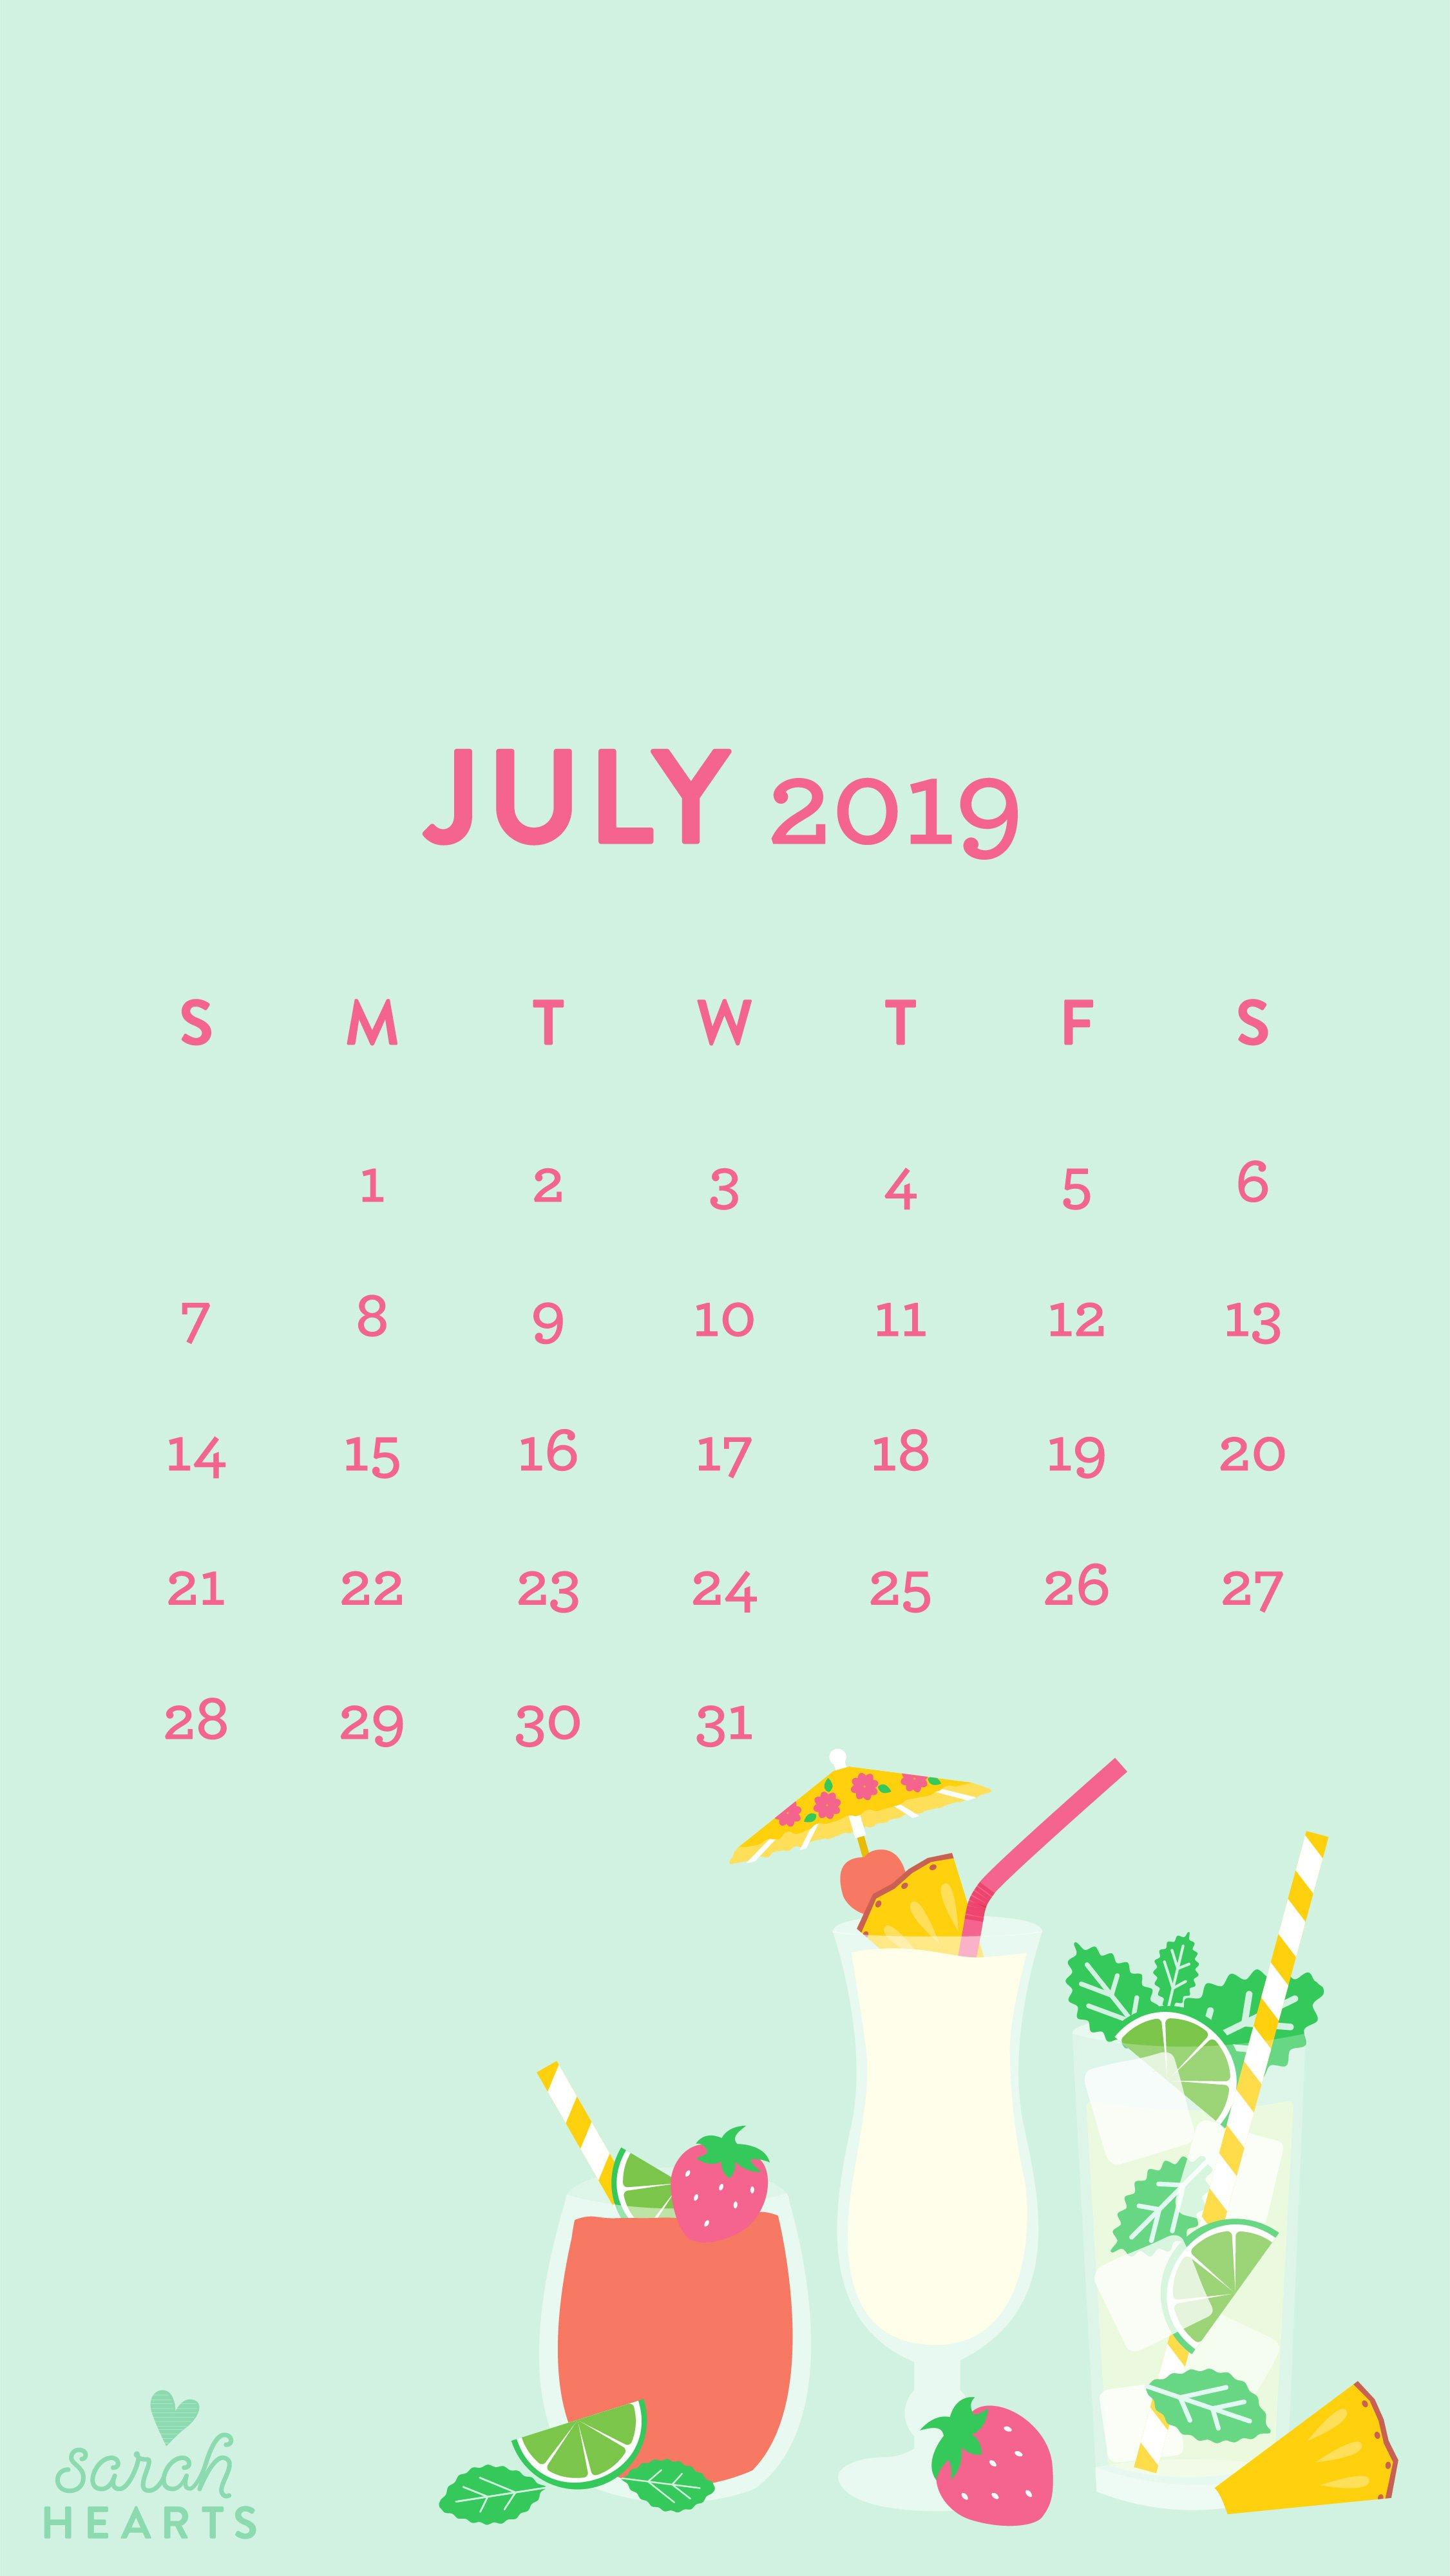 July 2019 Summer Drinks Calendar Wallpaper – Sarah Hearts July 8 2019 Calendar